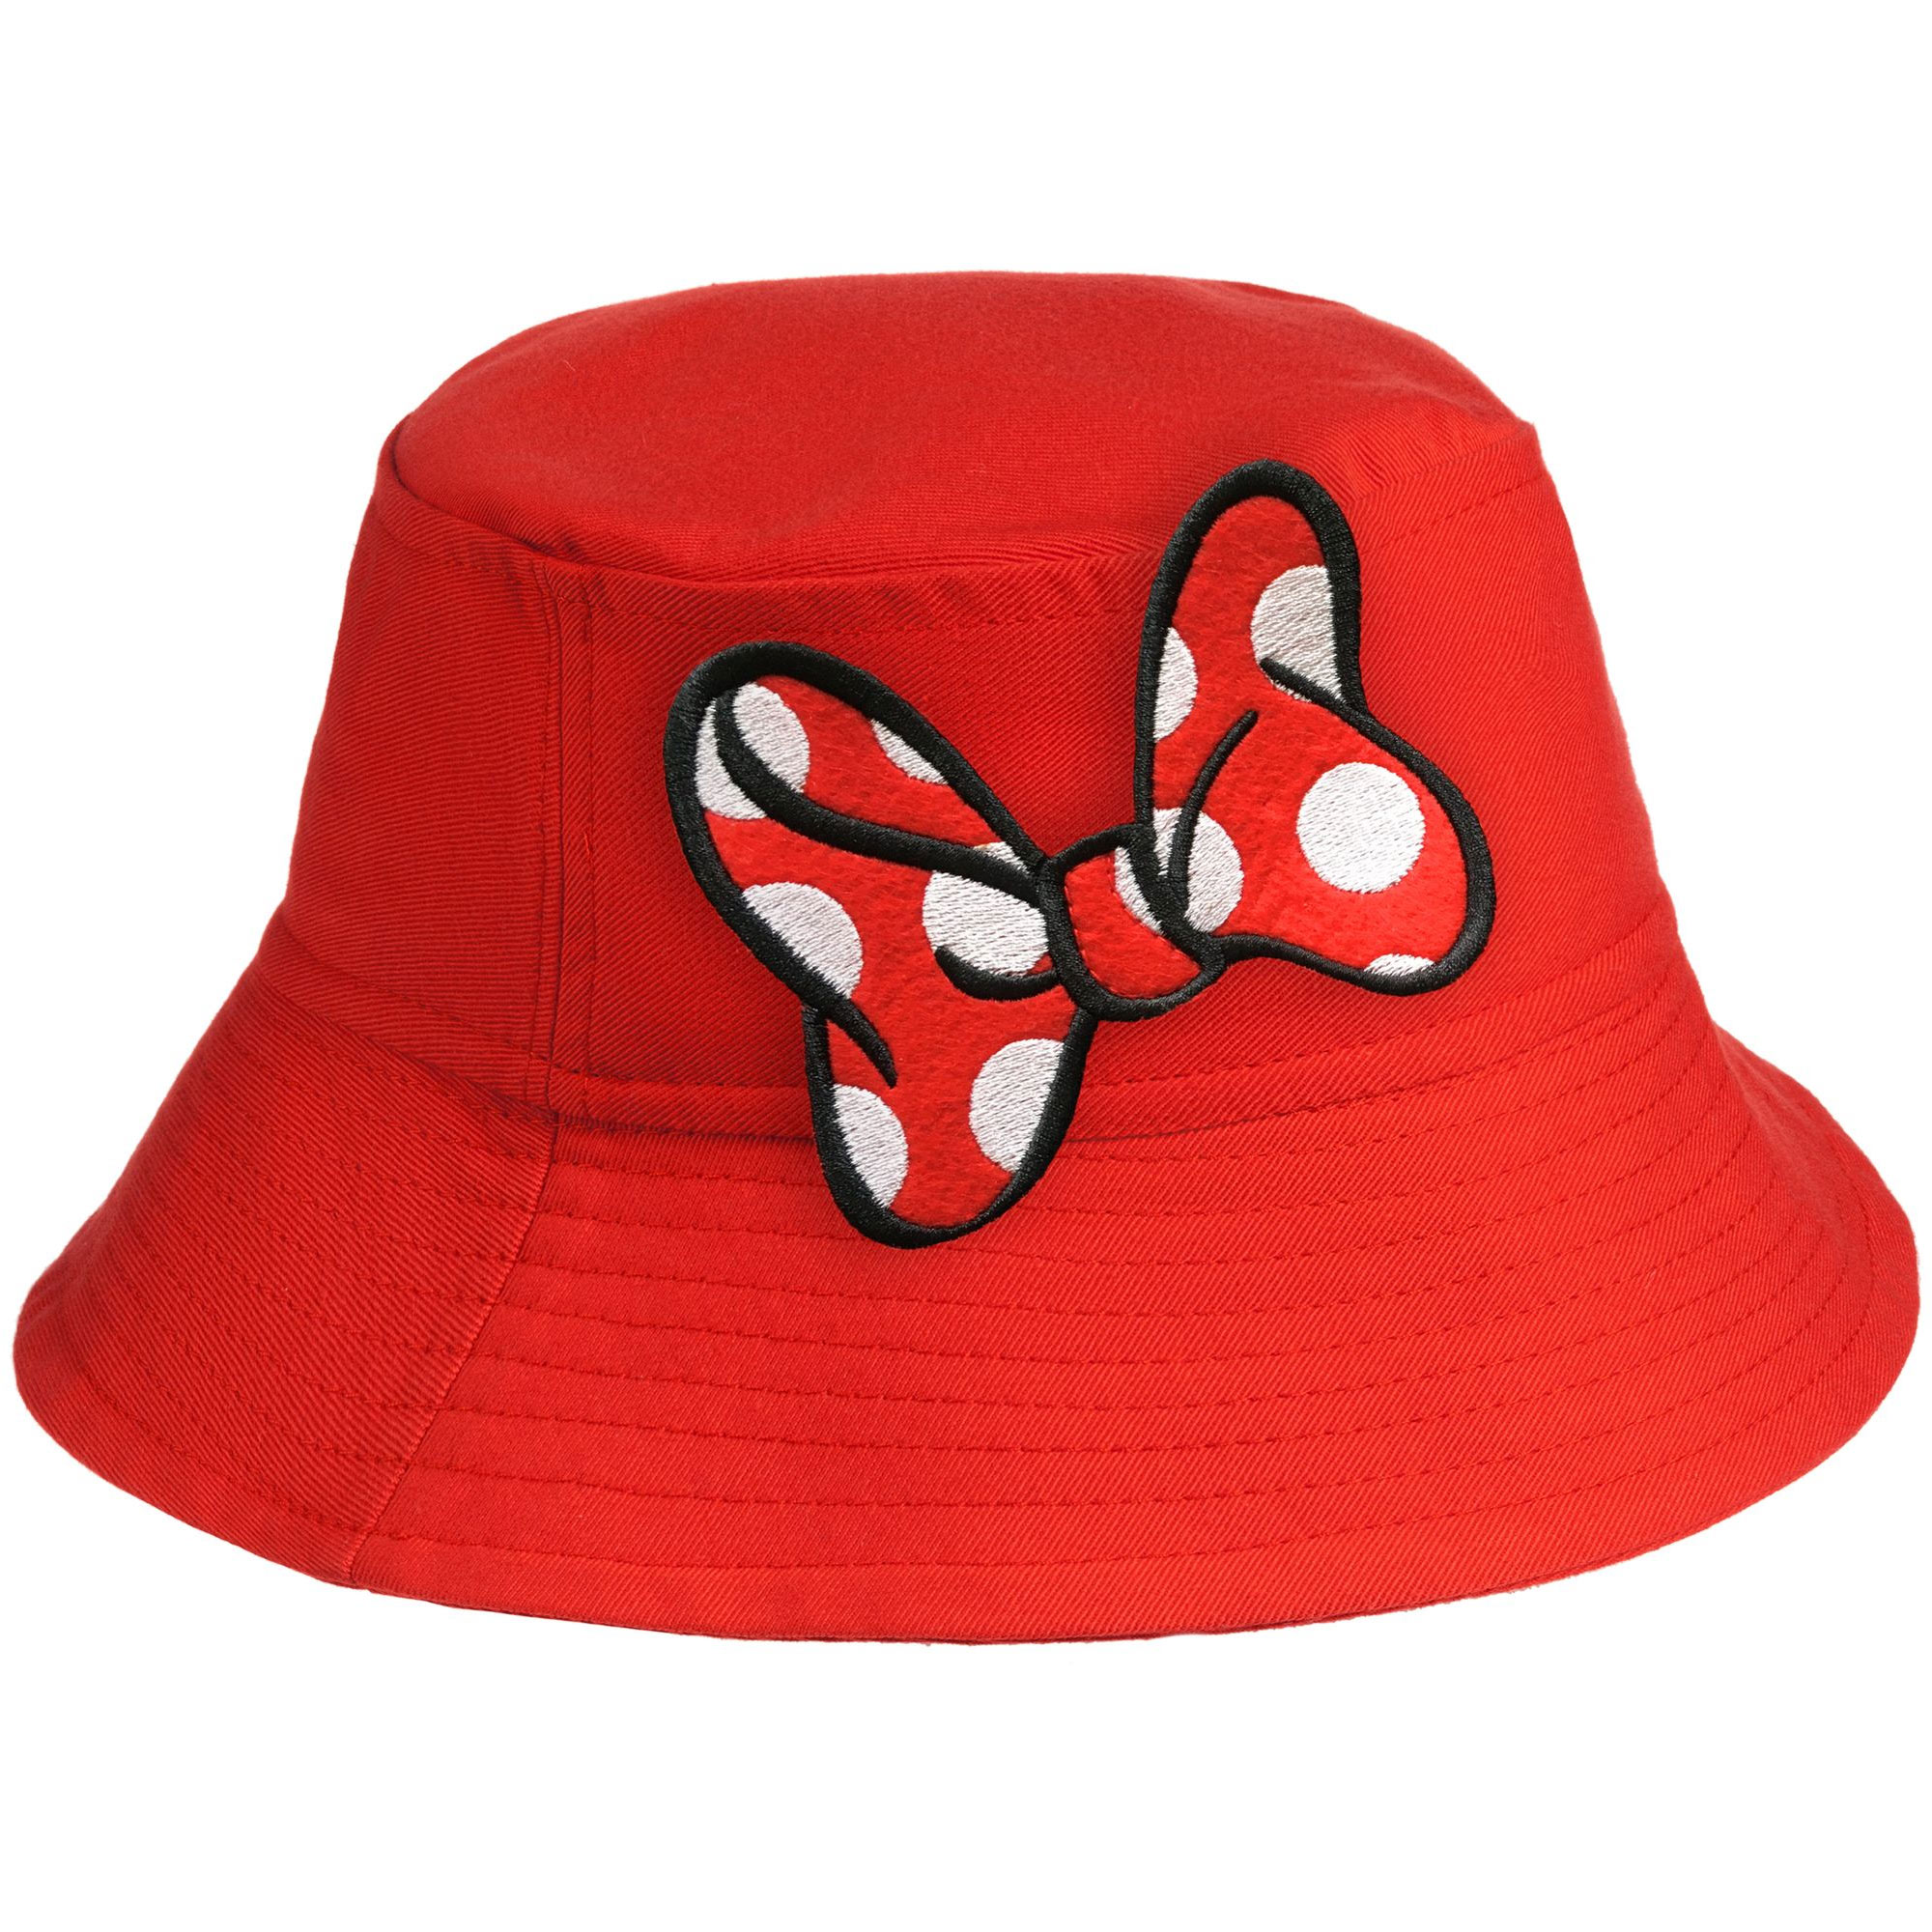 Панама детская «Бант Минни Маус», красная арт 55536.50